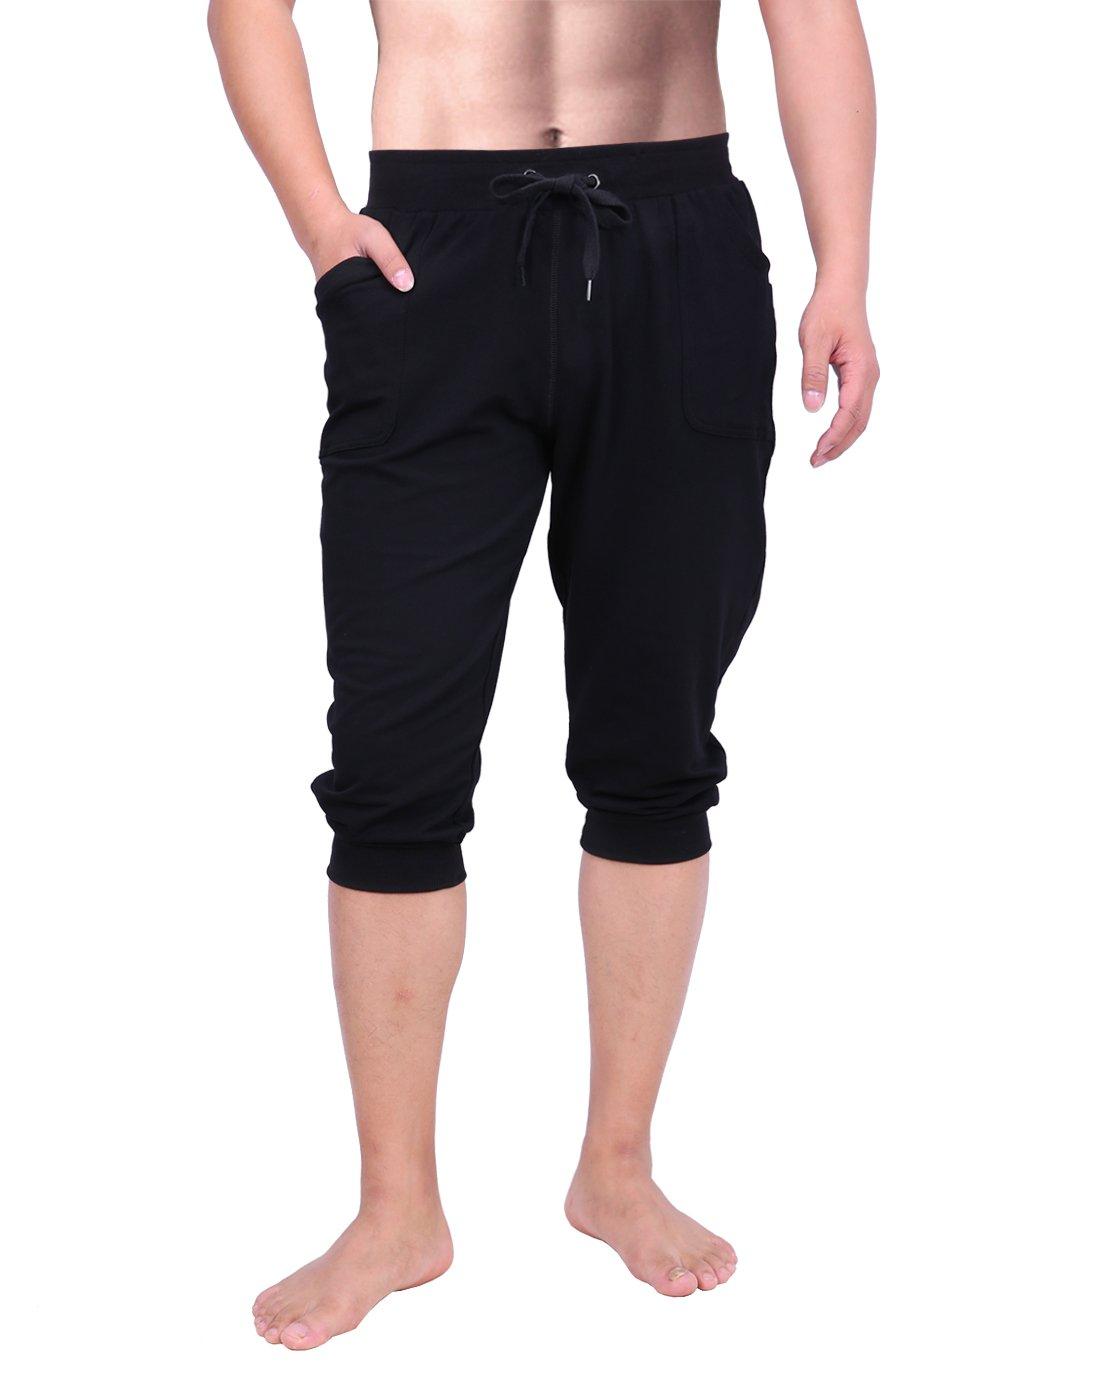 HDE Mens Workout Jogger Casual Waistband Sport Training Cuffed Yoga Capri Pant (Black, Small)